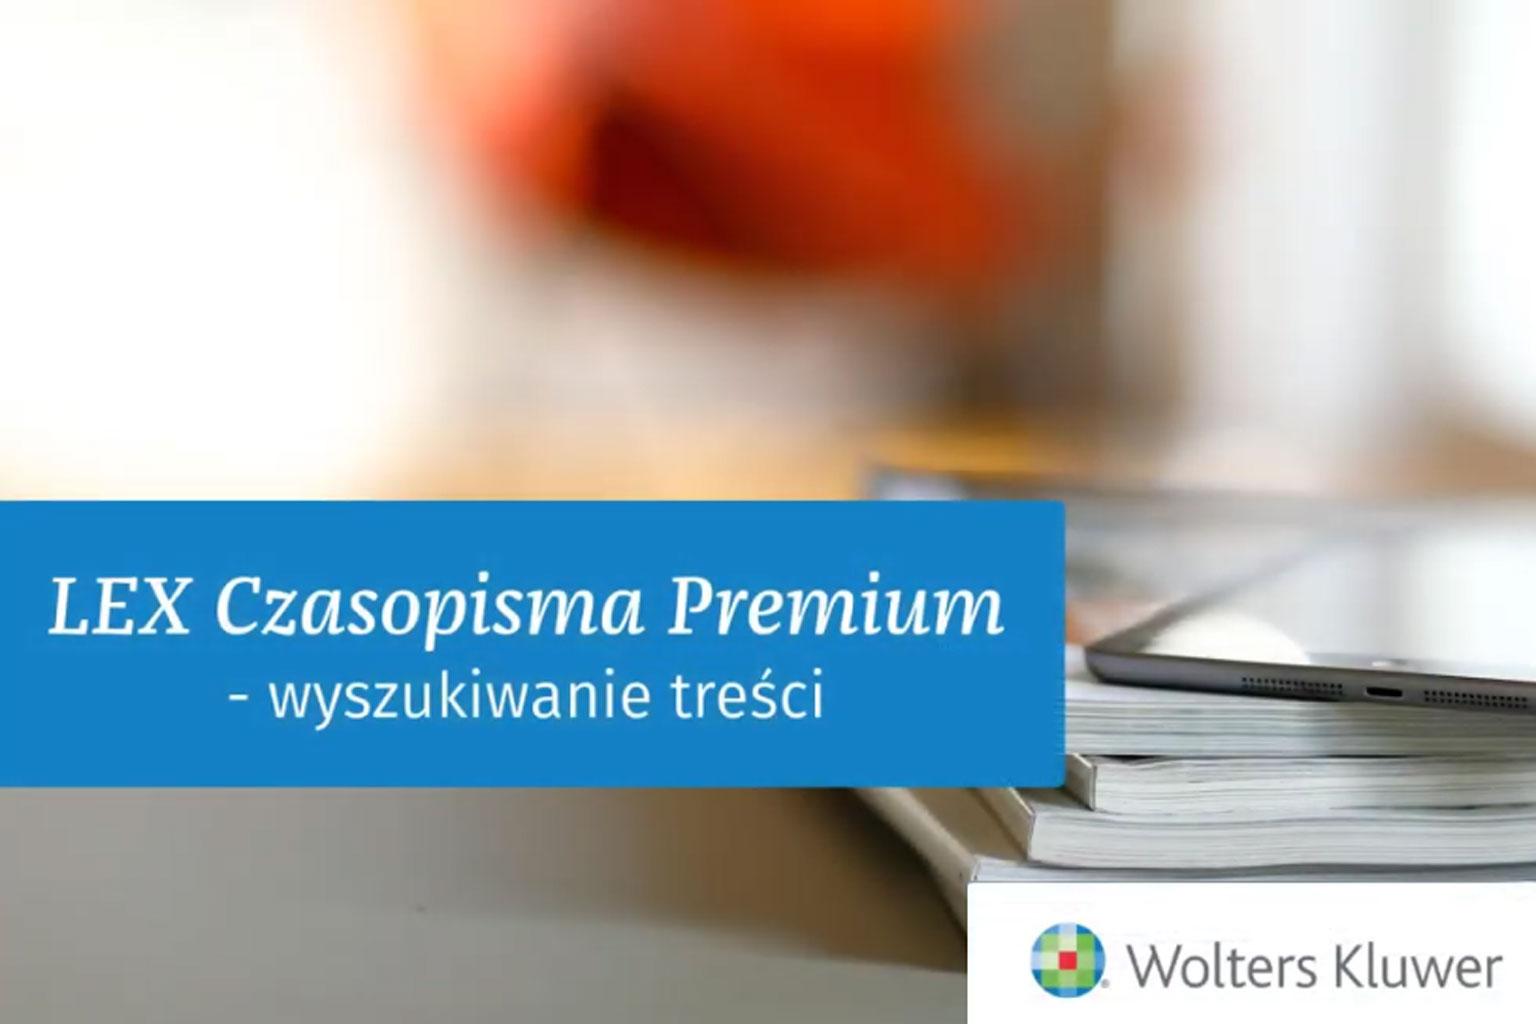 LEX Czasopisma Premium